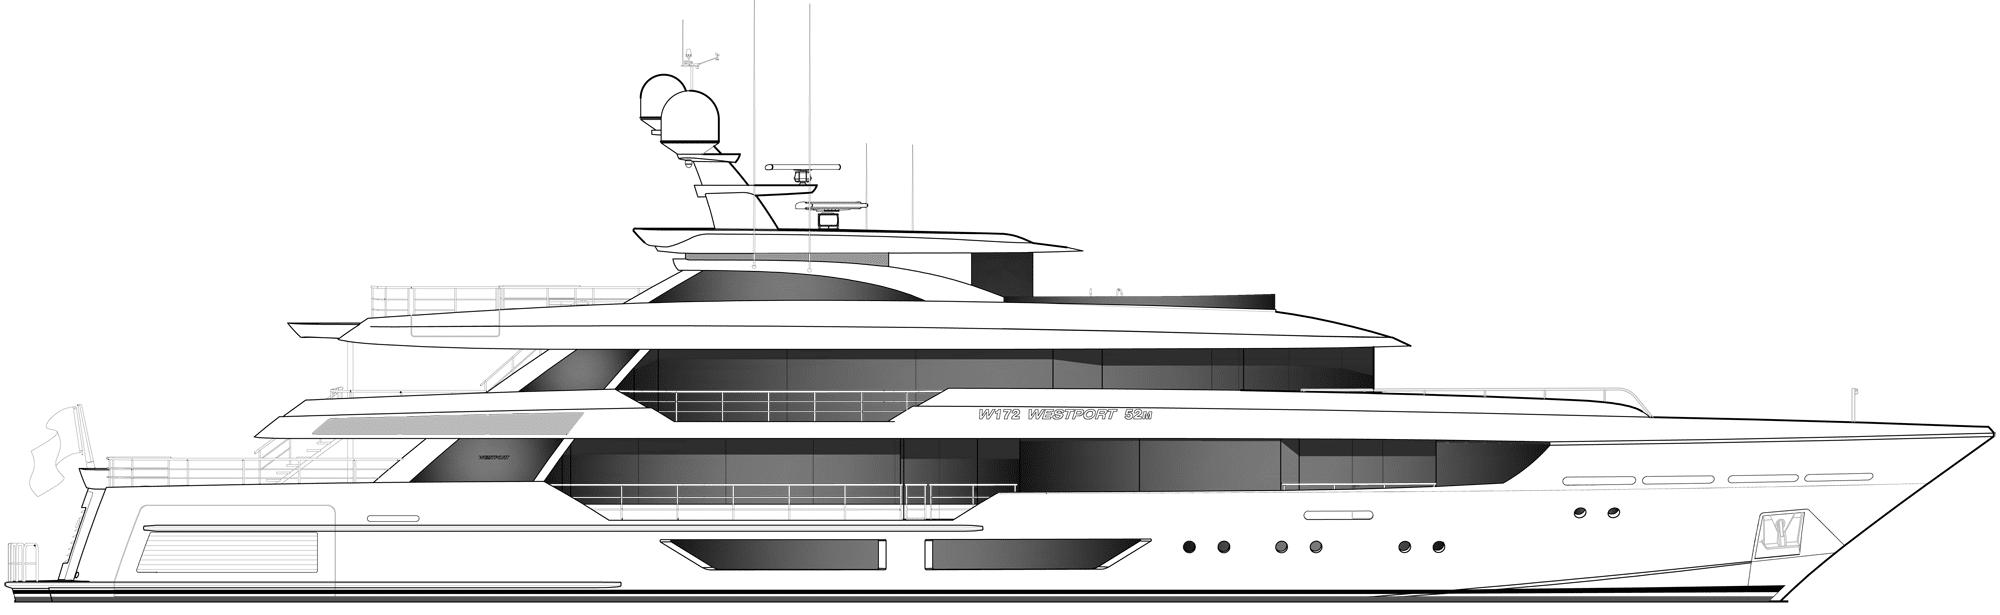 Westport W172 - 52m   Profile